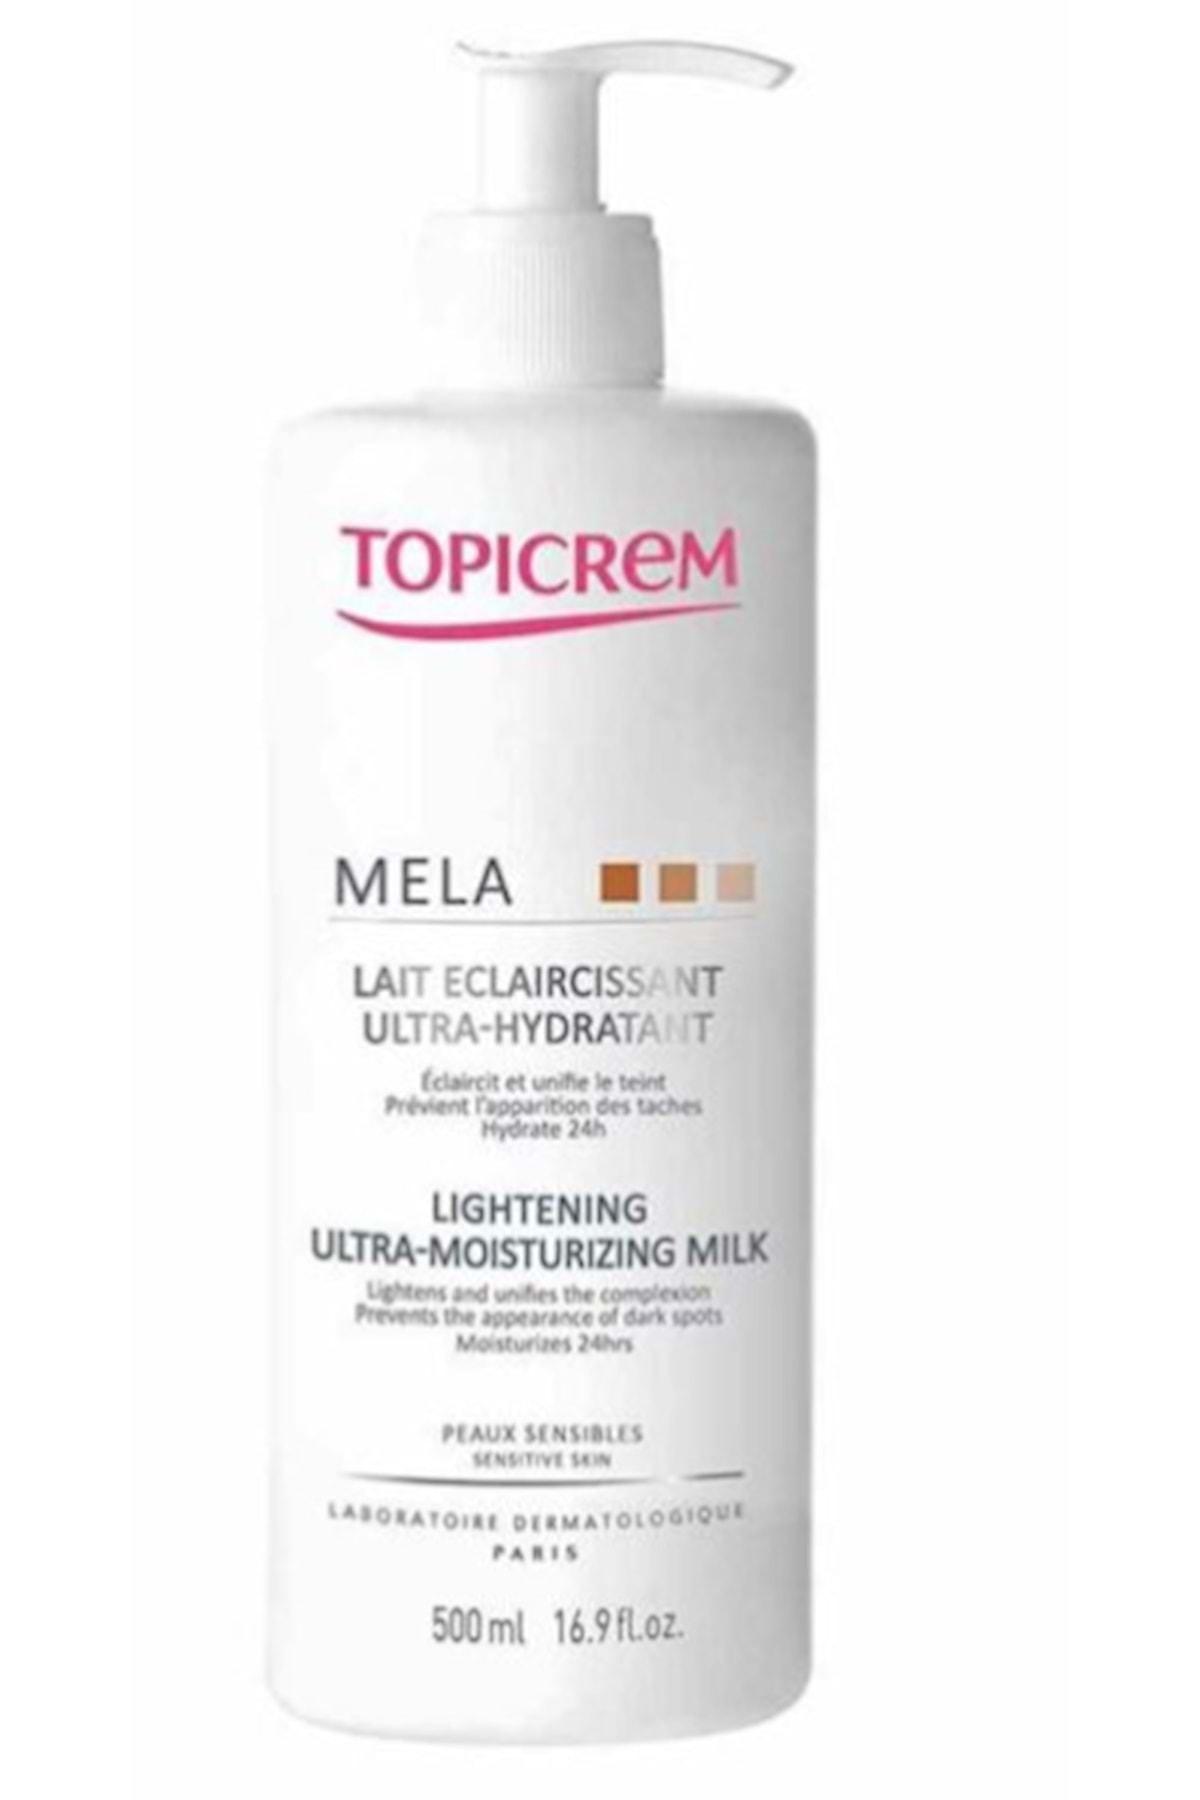 Topicrem Mela Lightening Ultra-moisturizing Milk 500 Ml 1